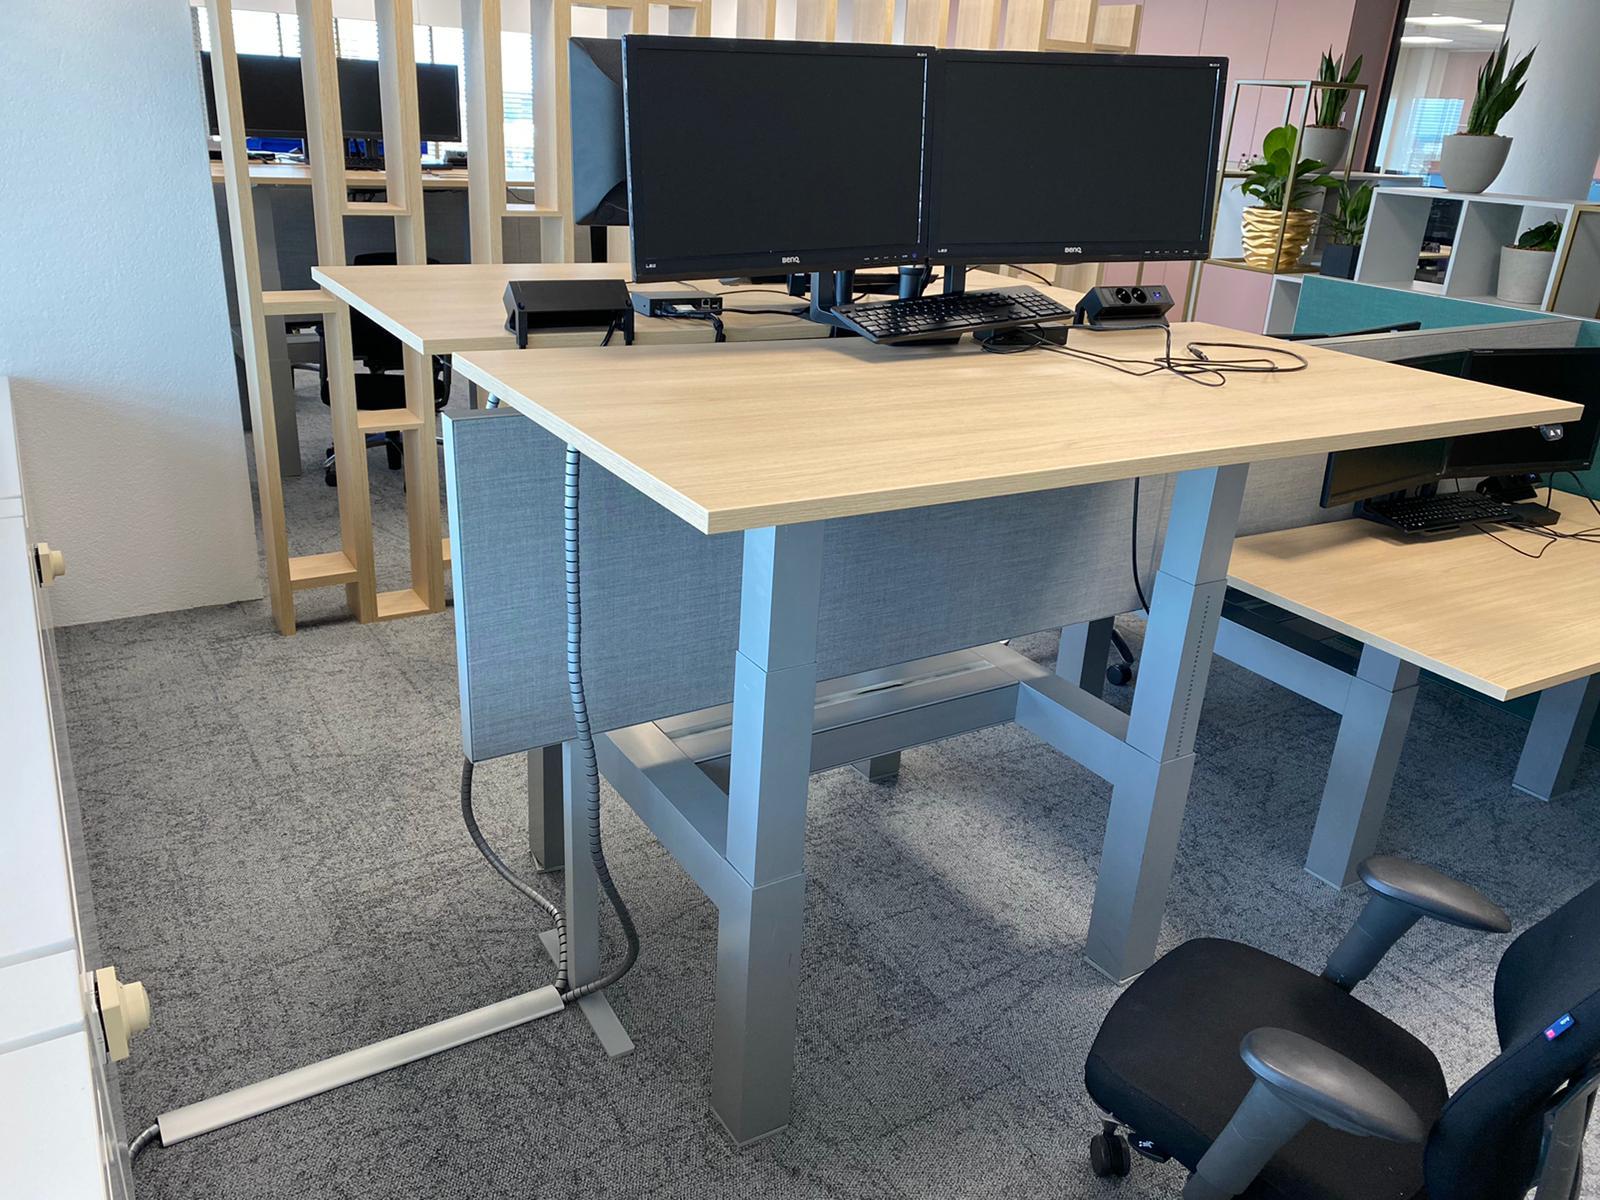 Sekondant - zit sta bureau - vloergoot - elektrificatie - kabelmanagement - cable eater - monitor arm - flexible werkplek